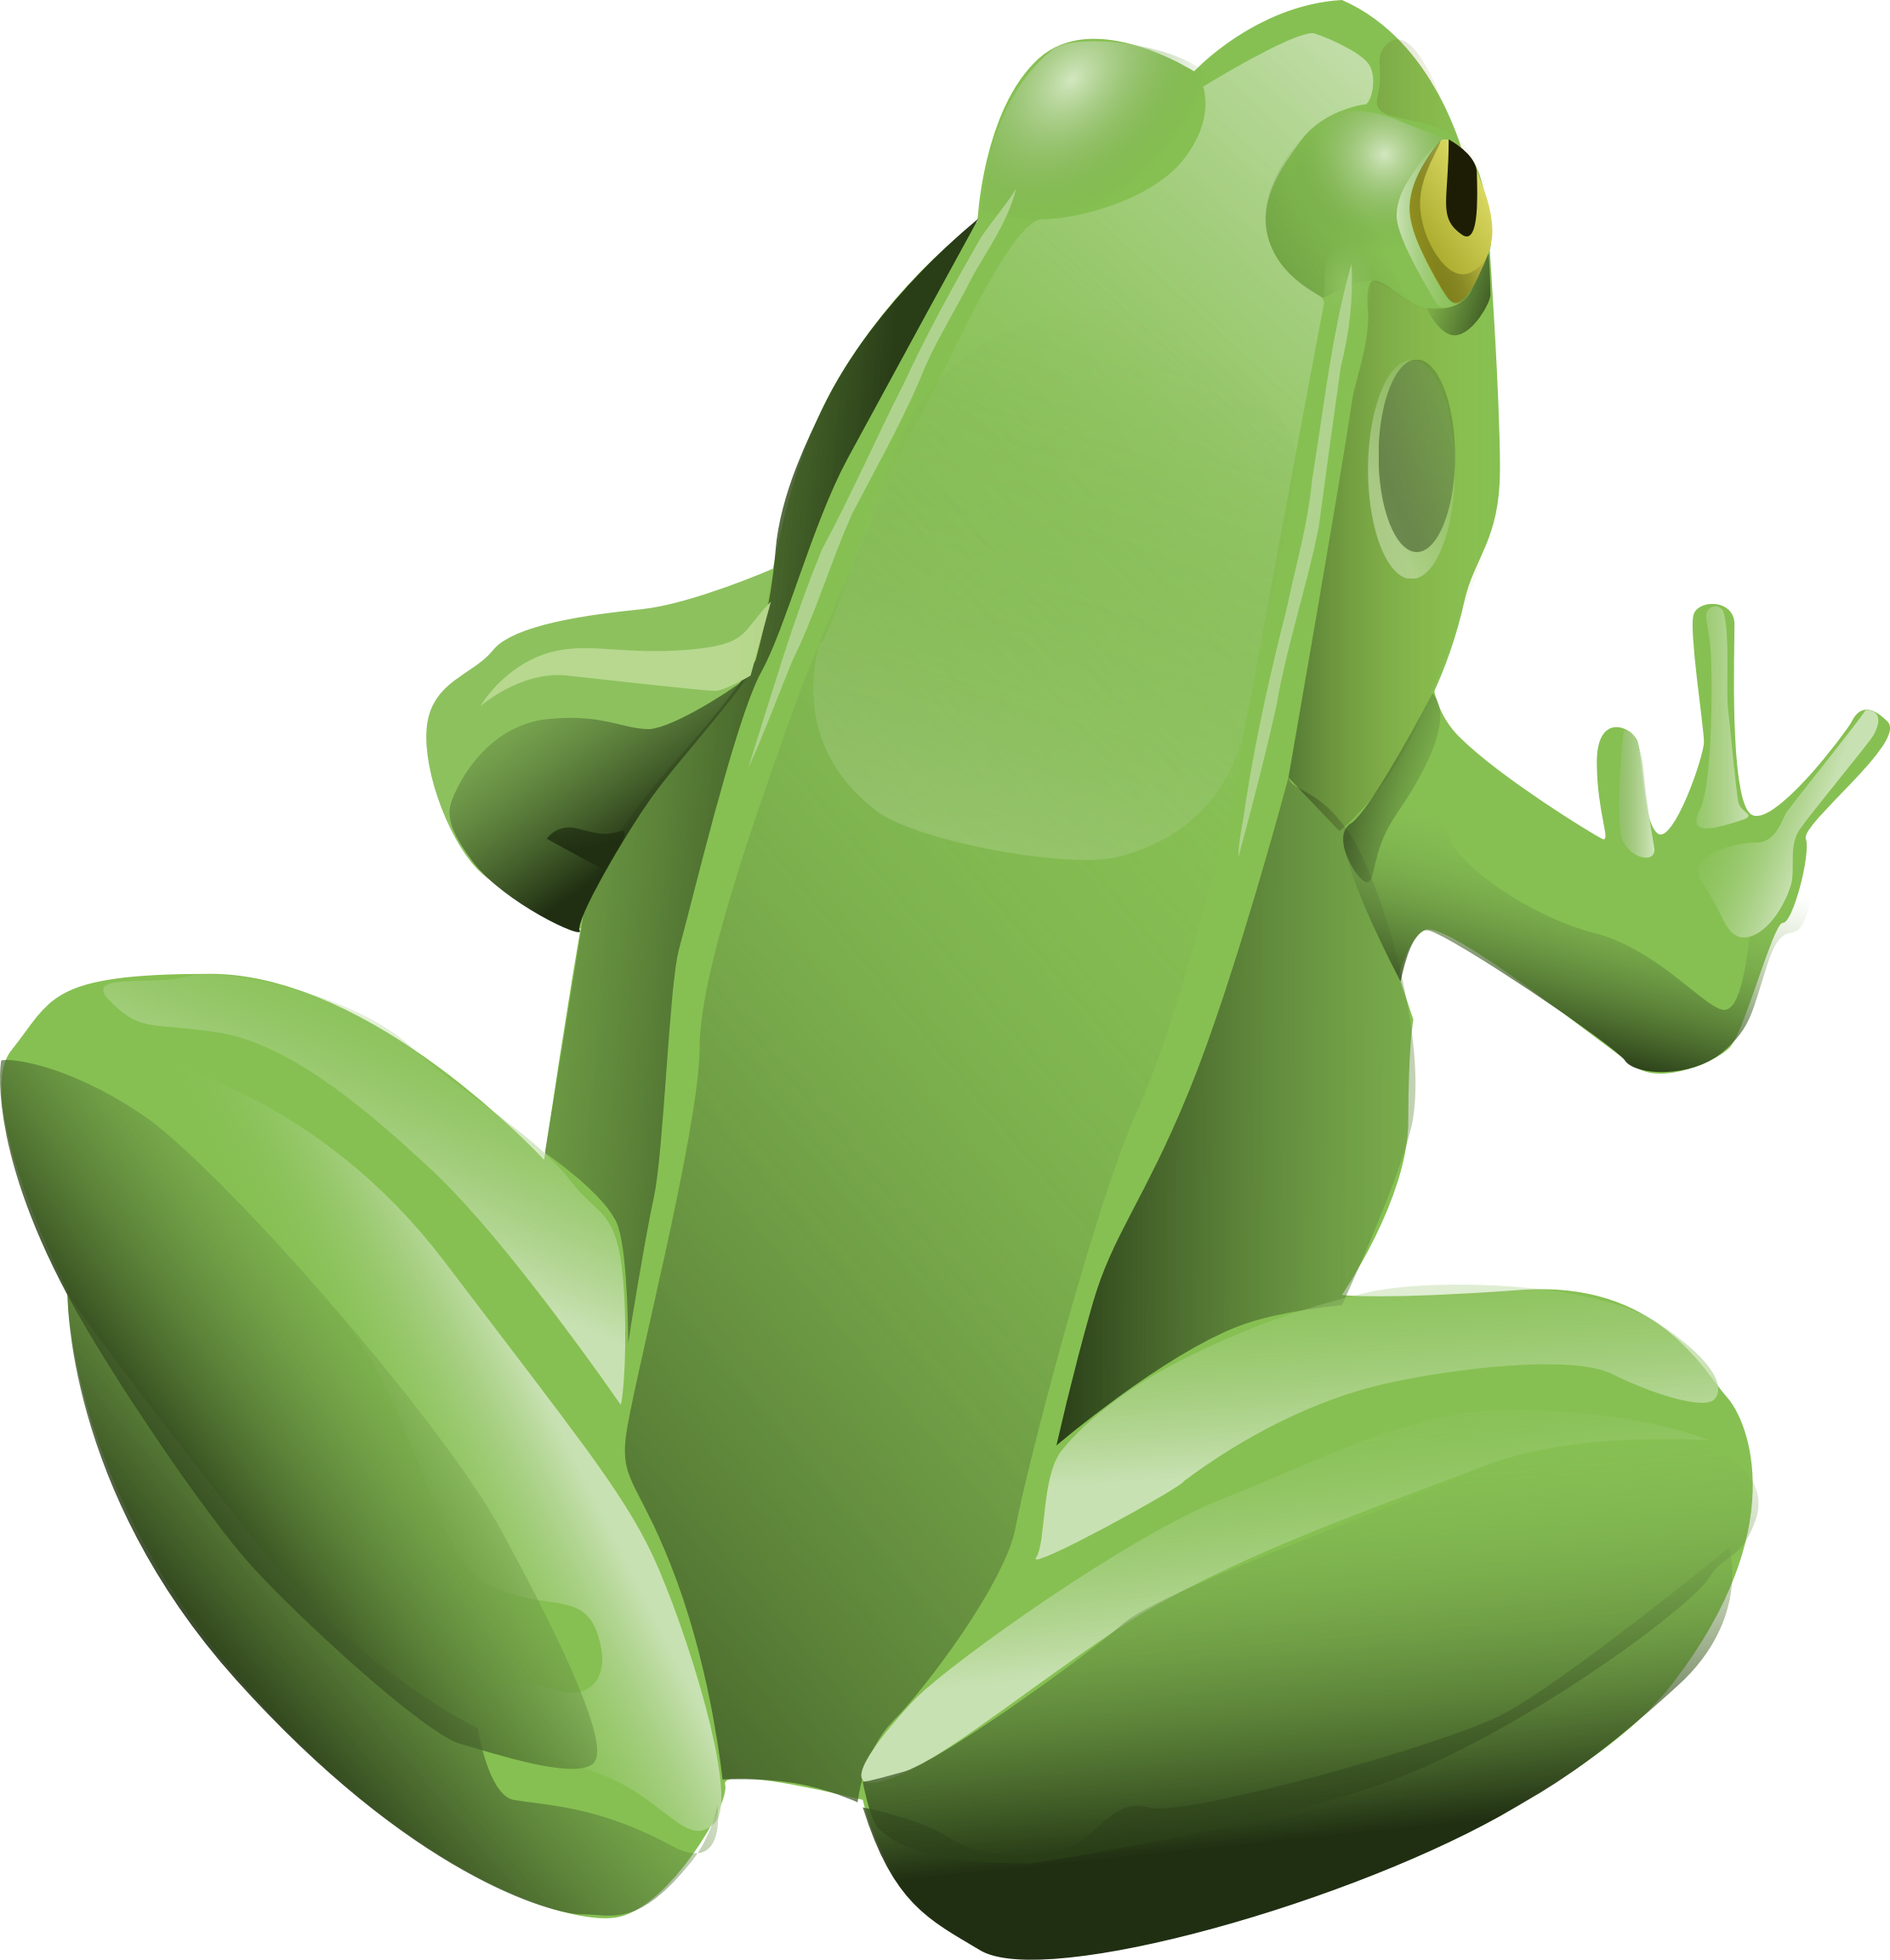 Clipart frog animal. Cool big image png